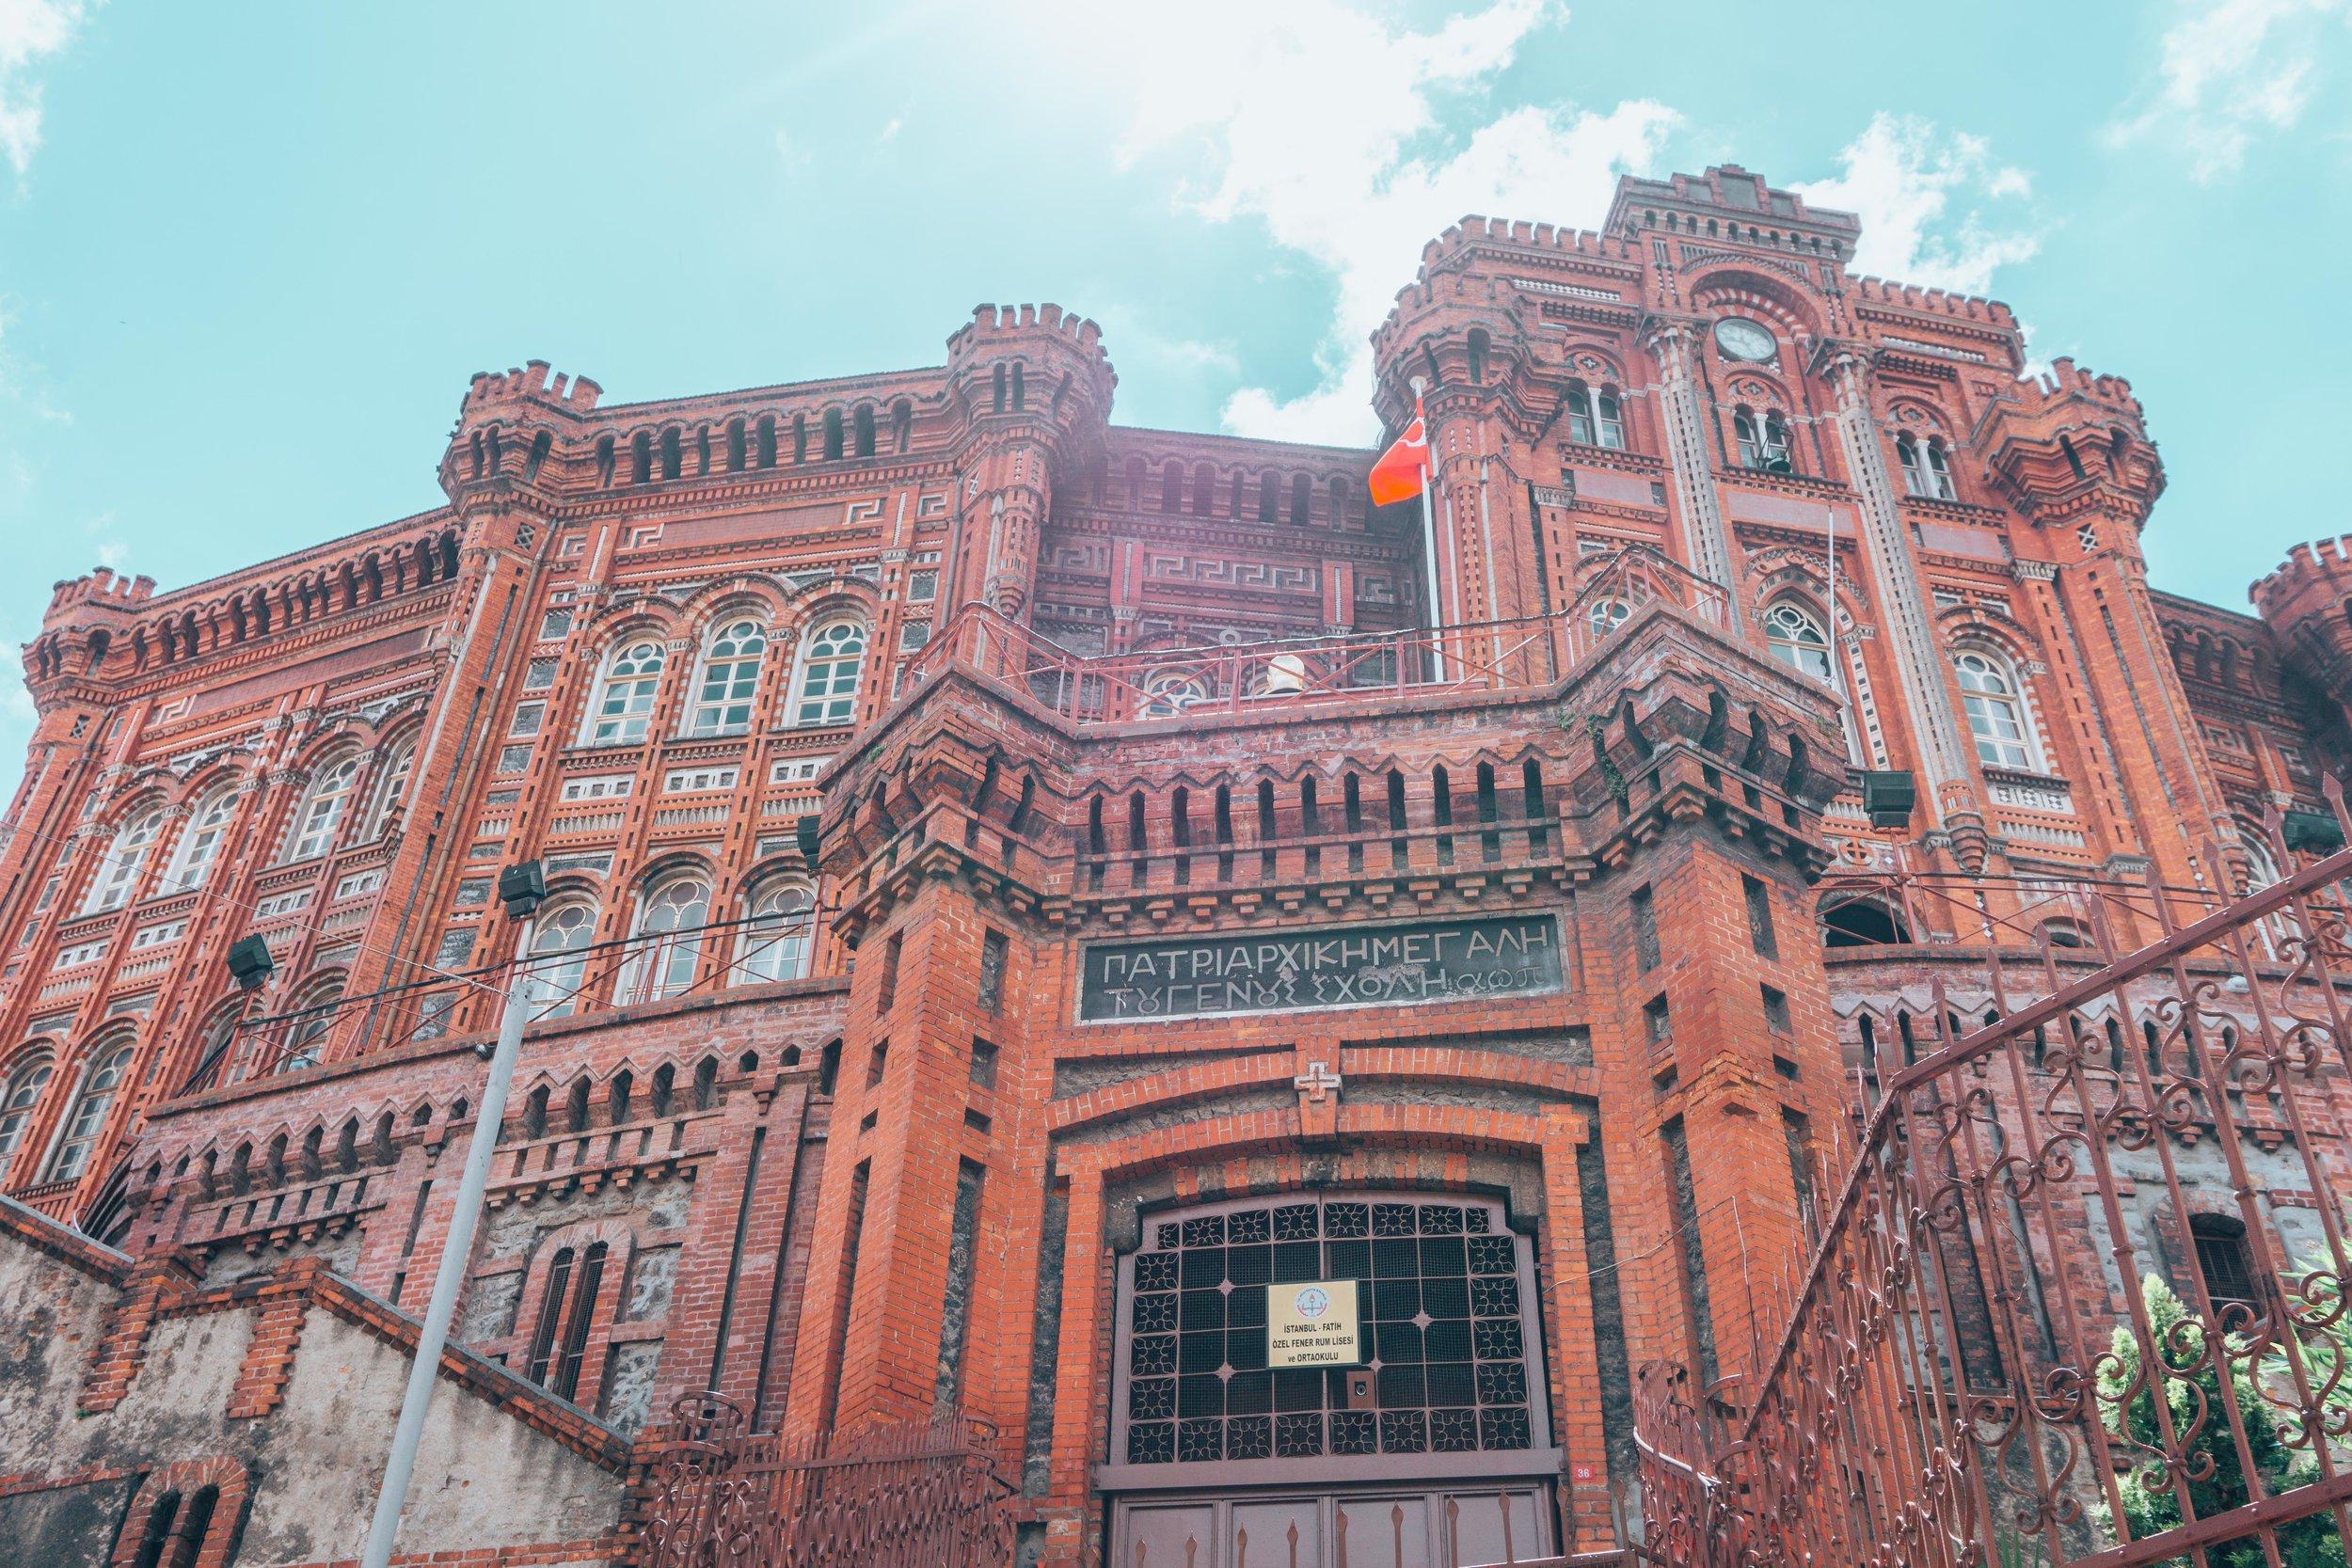 Balat's Greek Orthodox College Fener